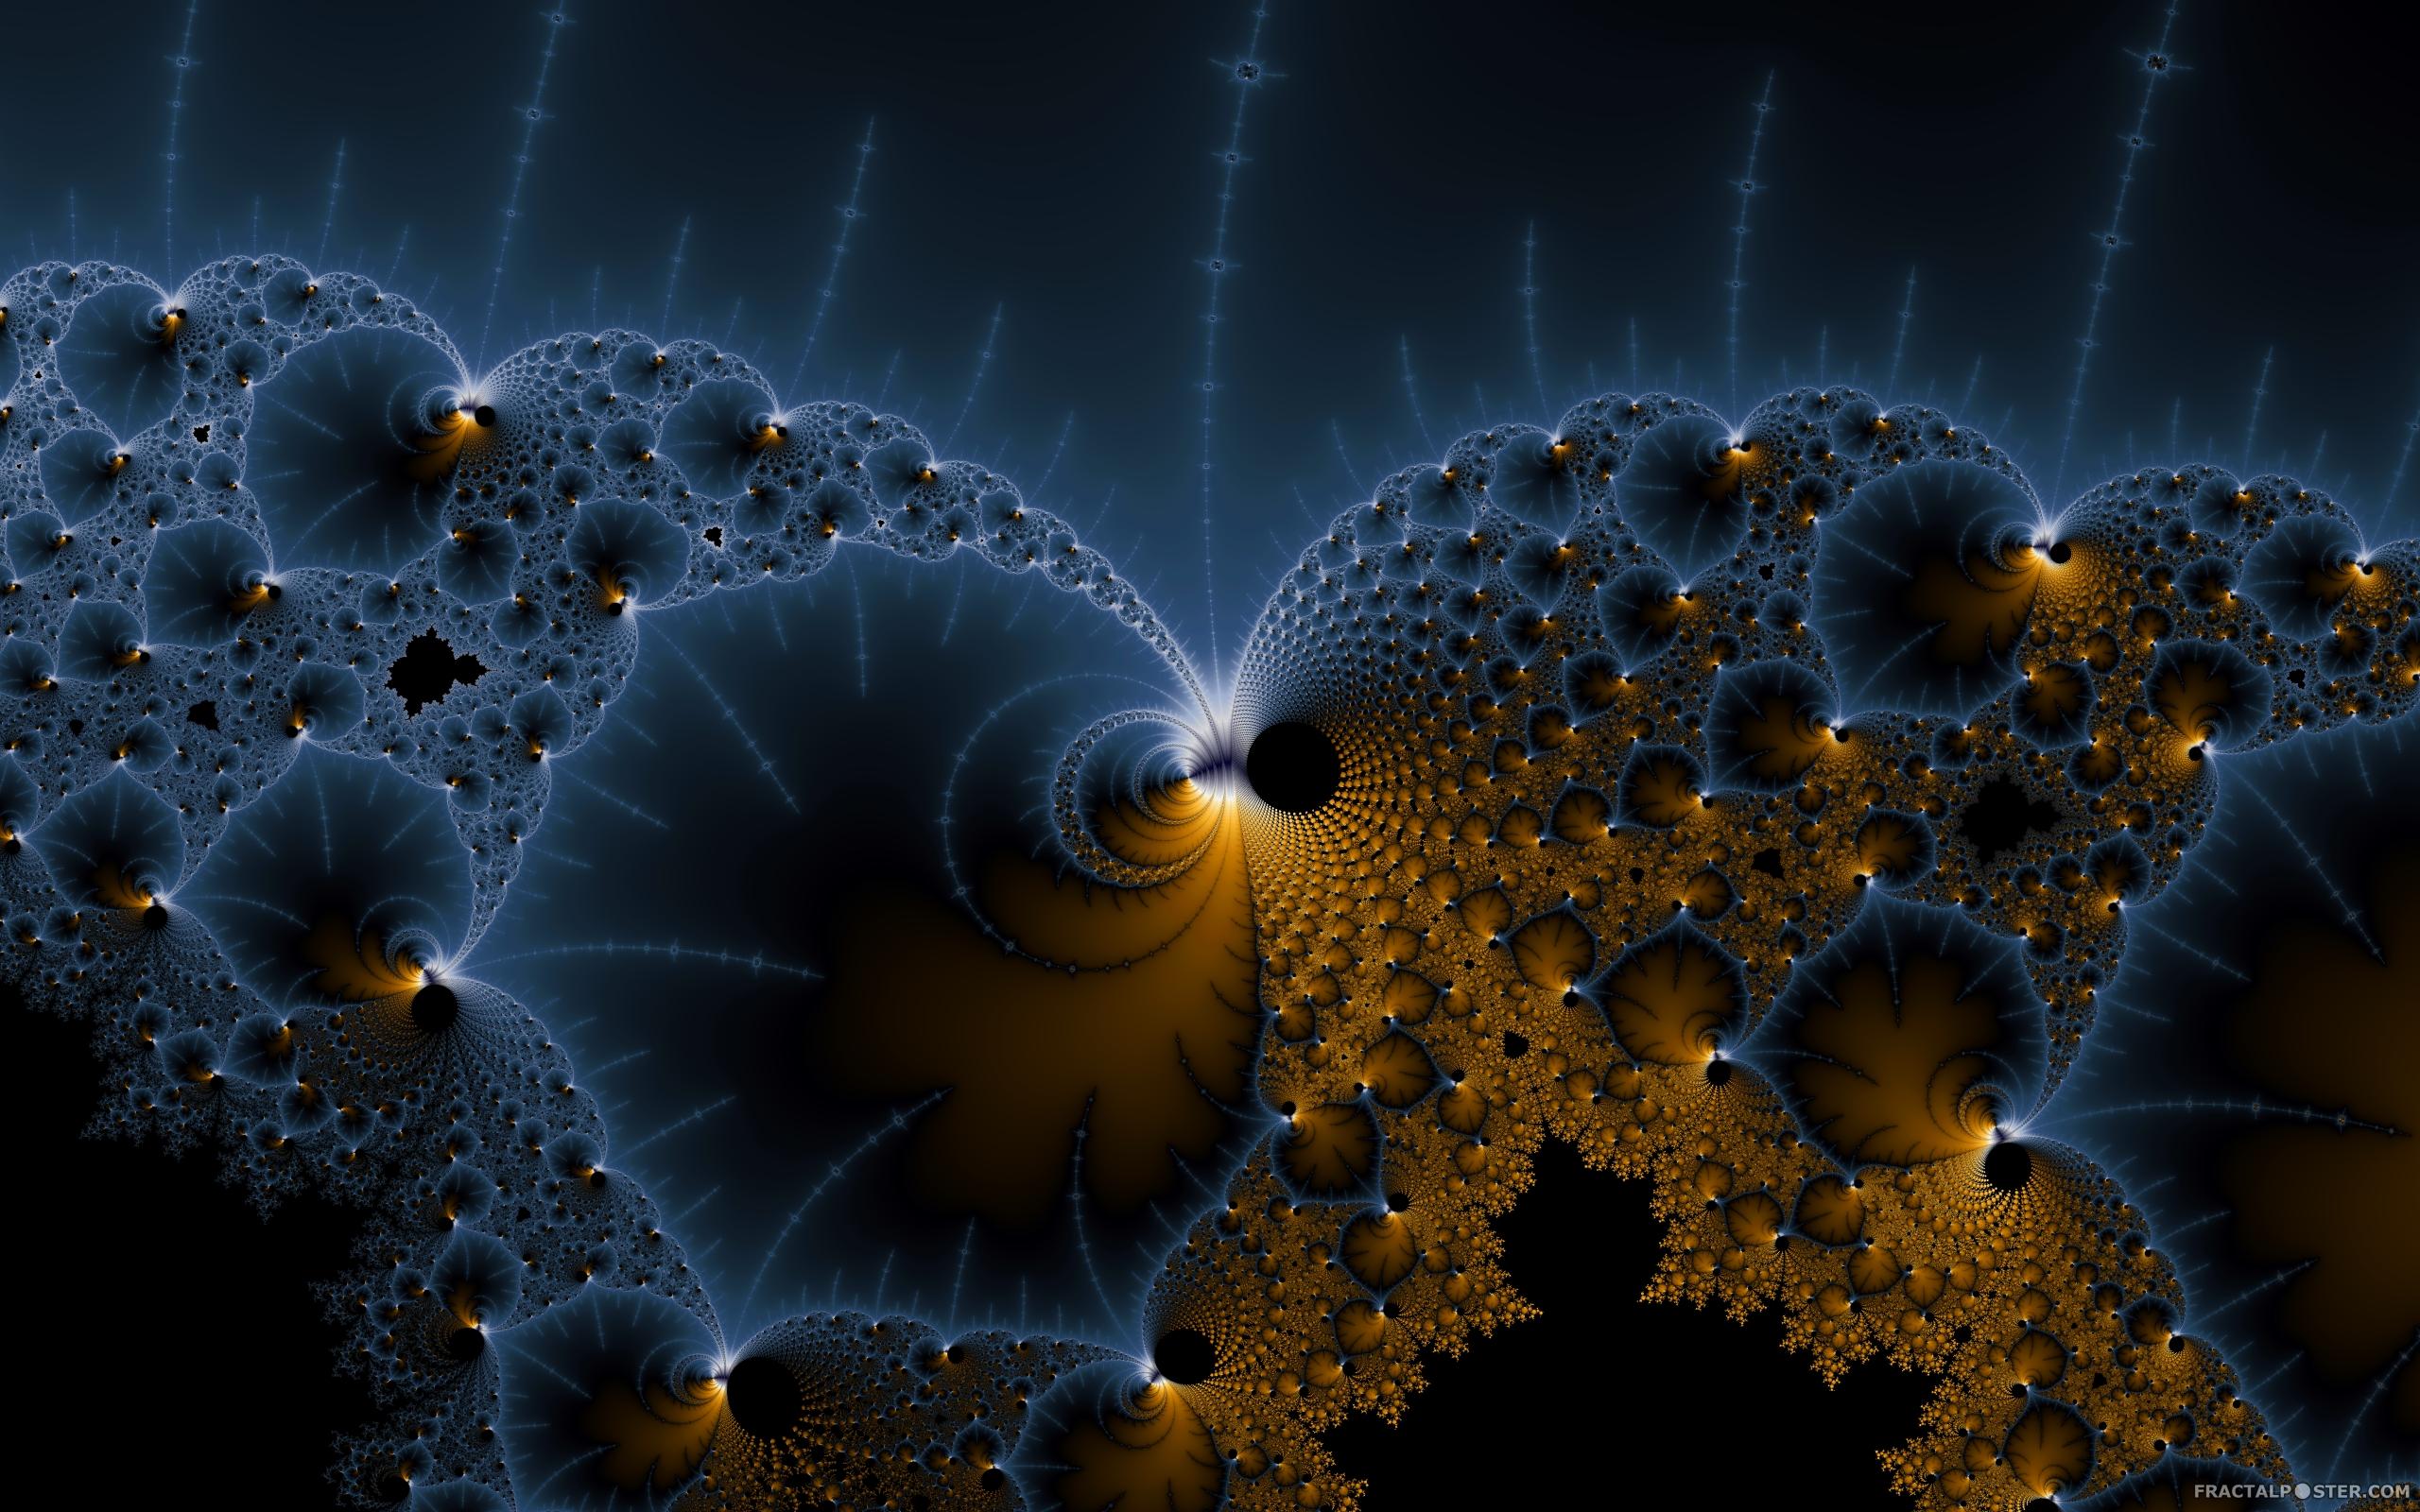 1280x960 fractals 2560x1600 - photo #16